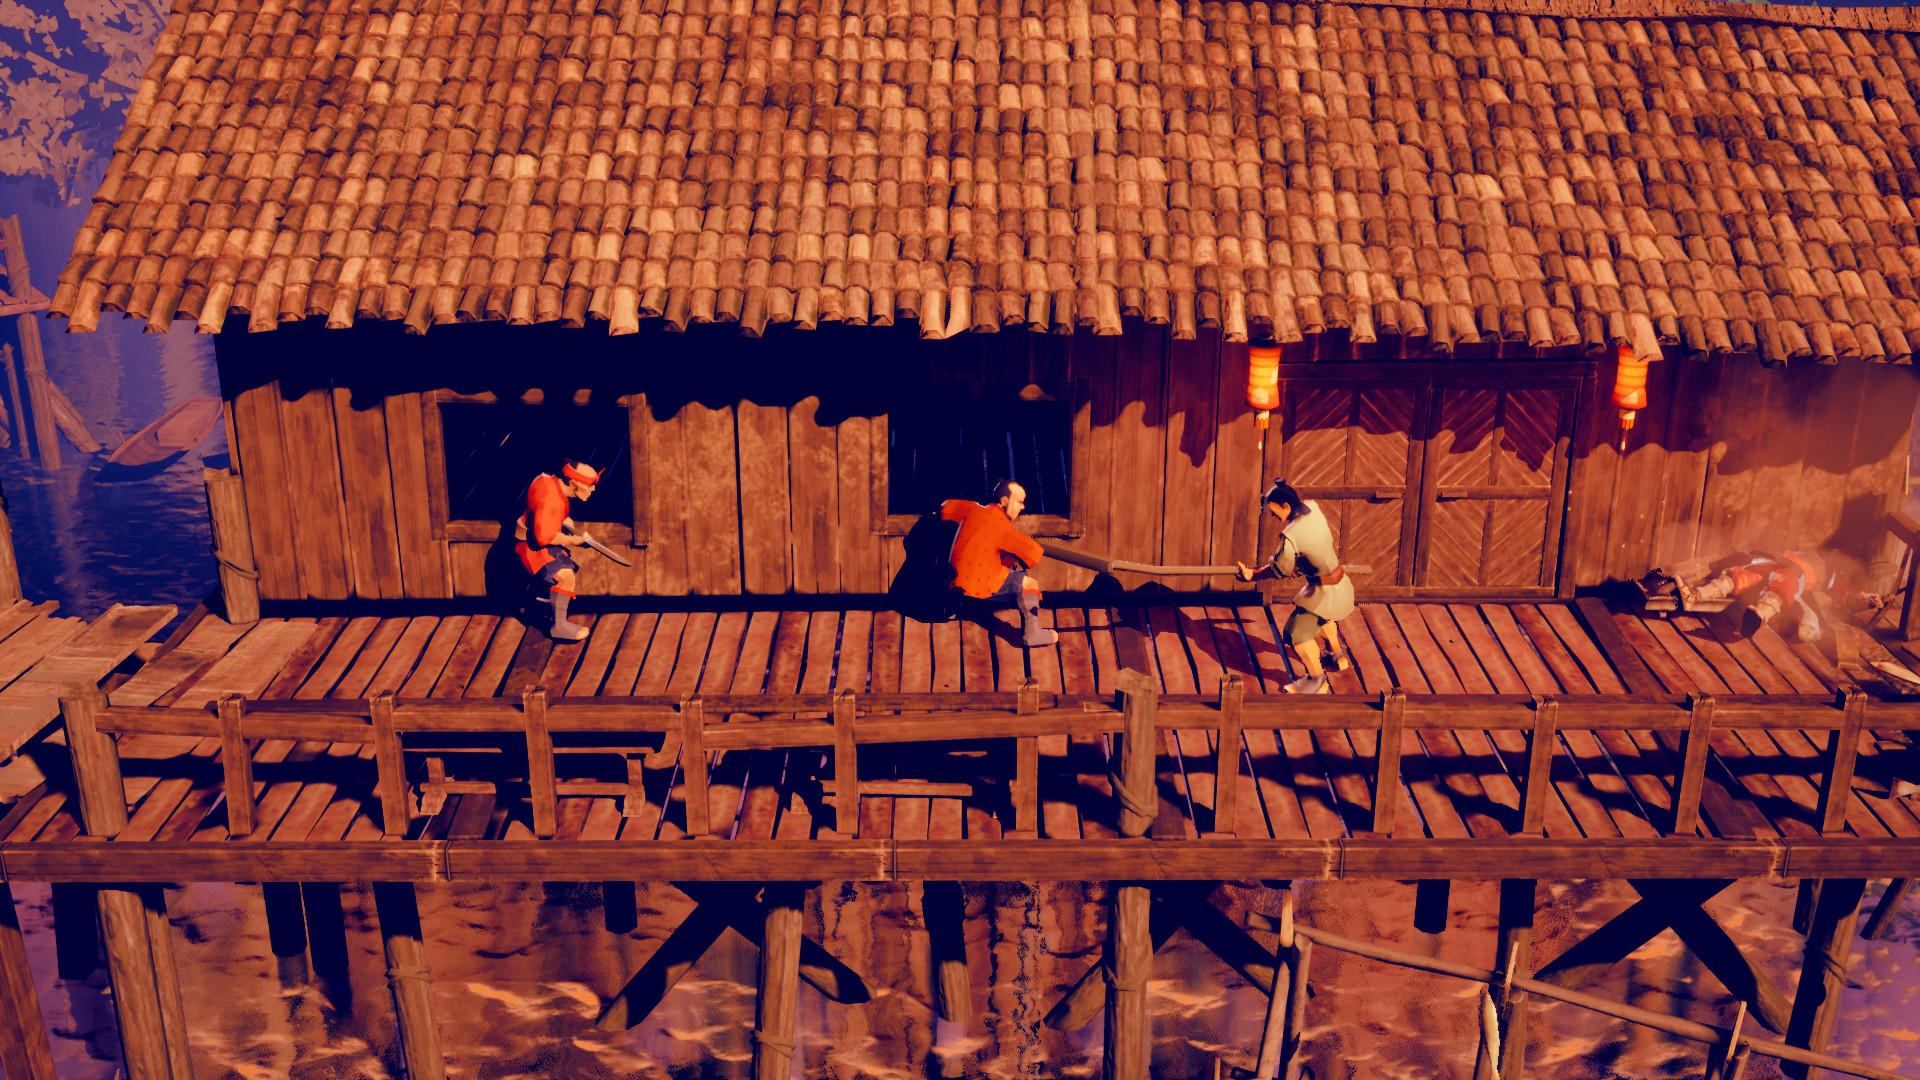 少林九武猴.新版v1.2/ Monkeys of Shaolin